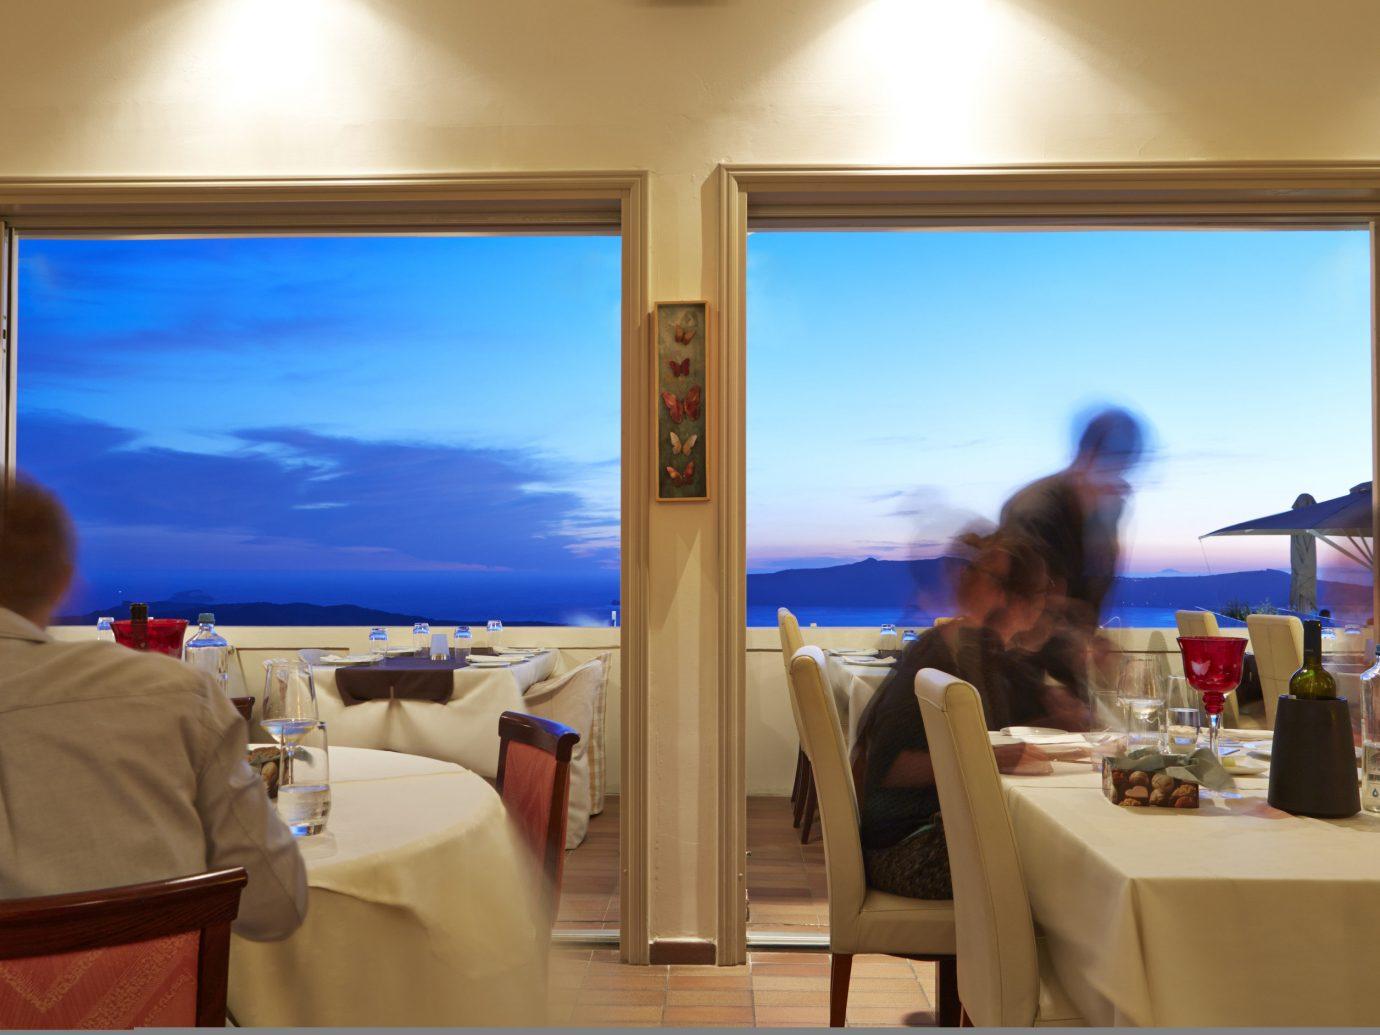 Trip Ideas indoor wall interior design restaurant